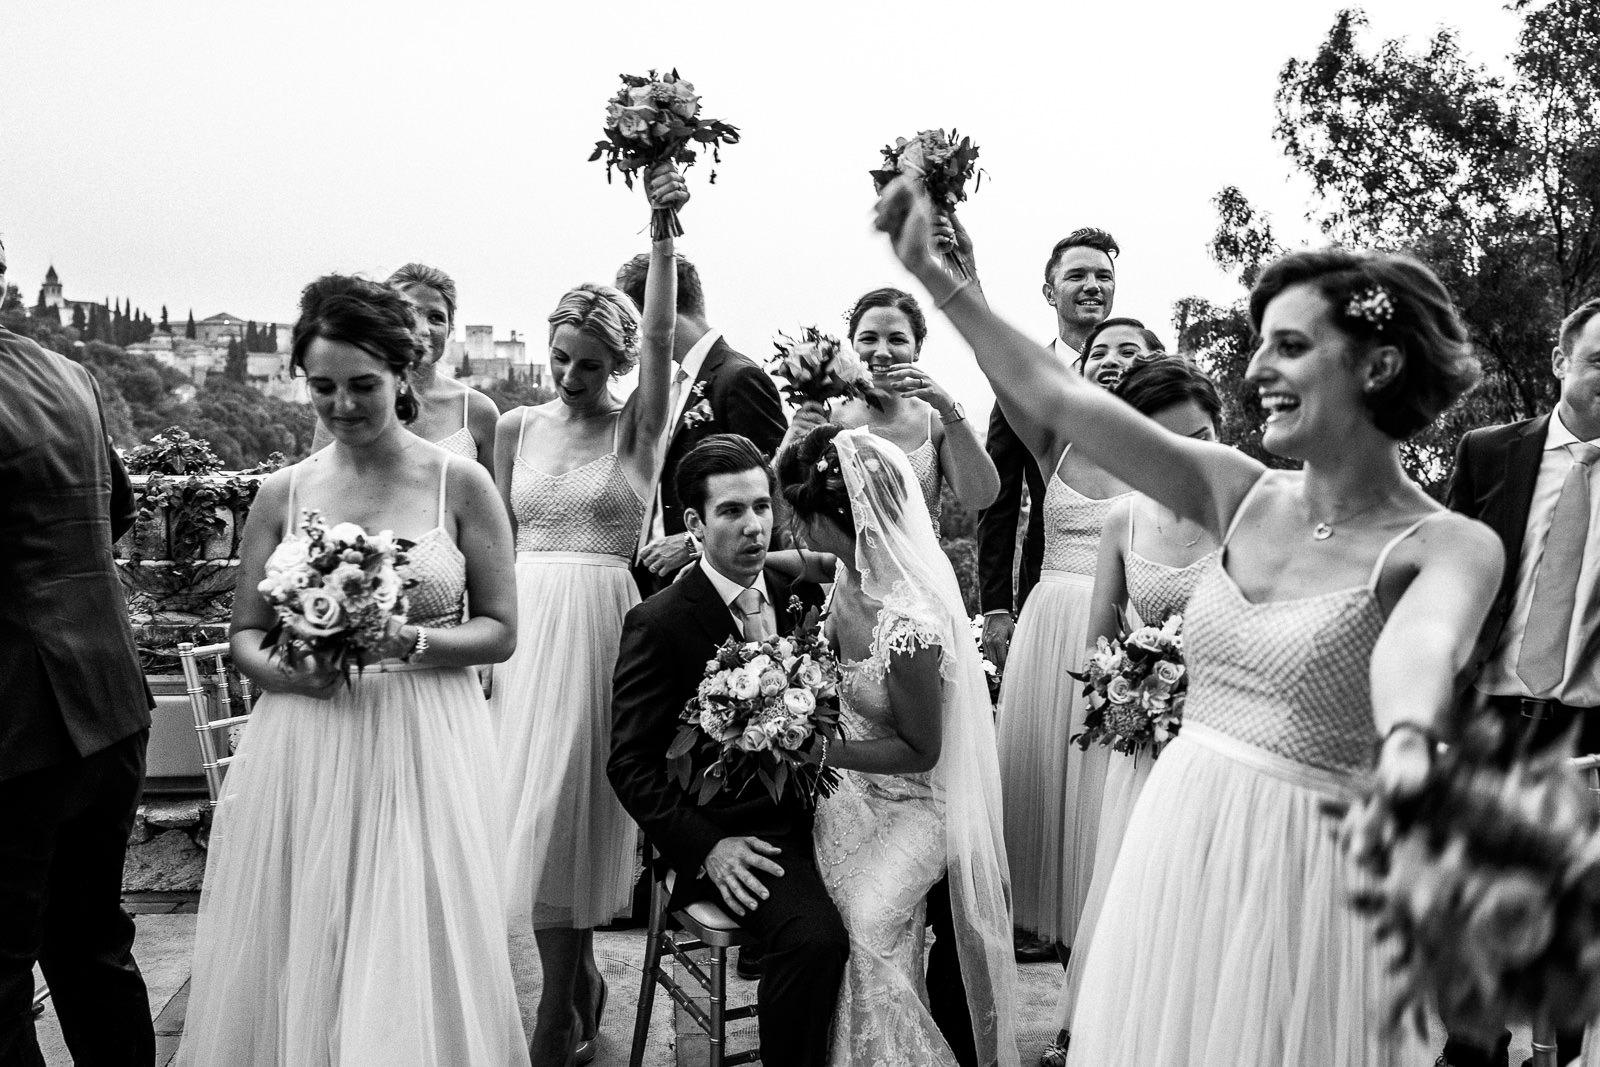 granada_destination_wedding_spain_061